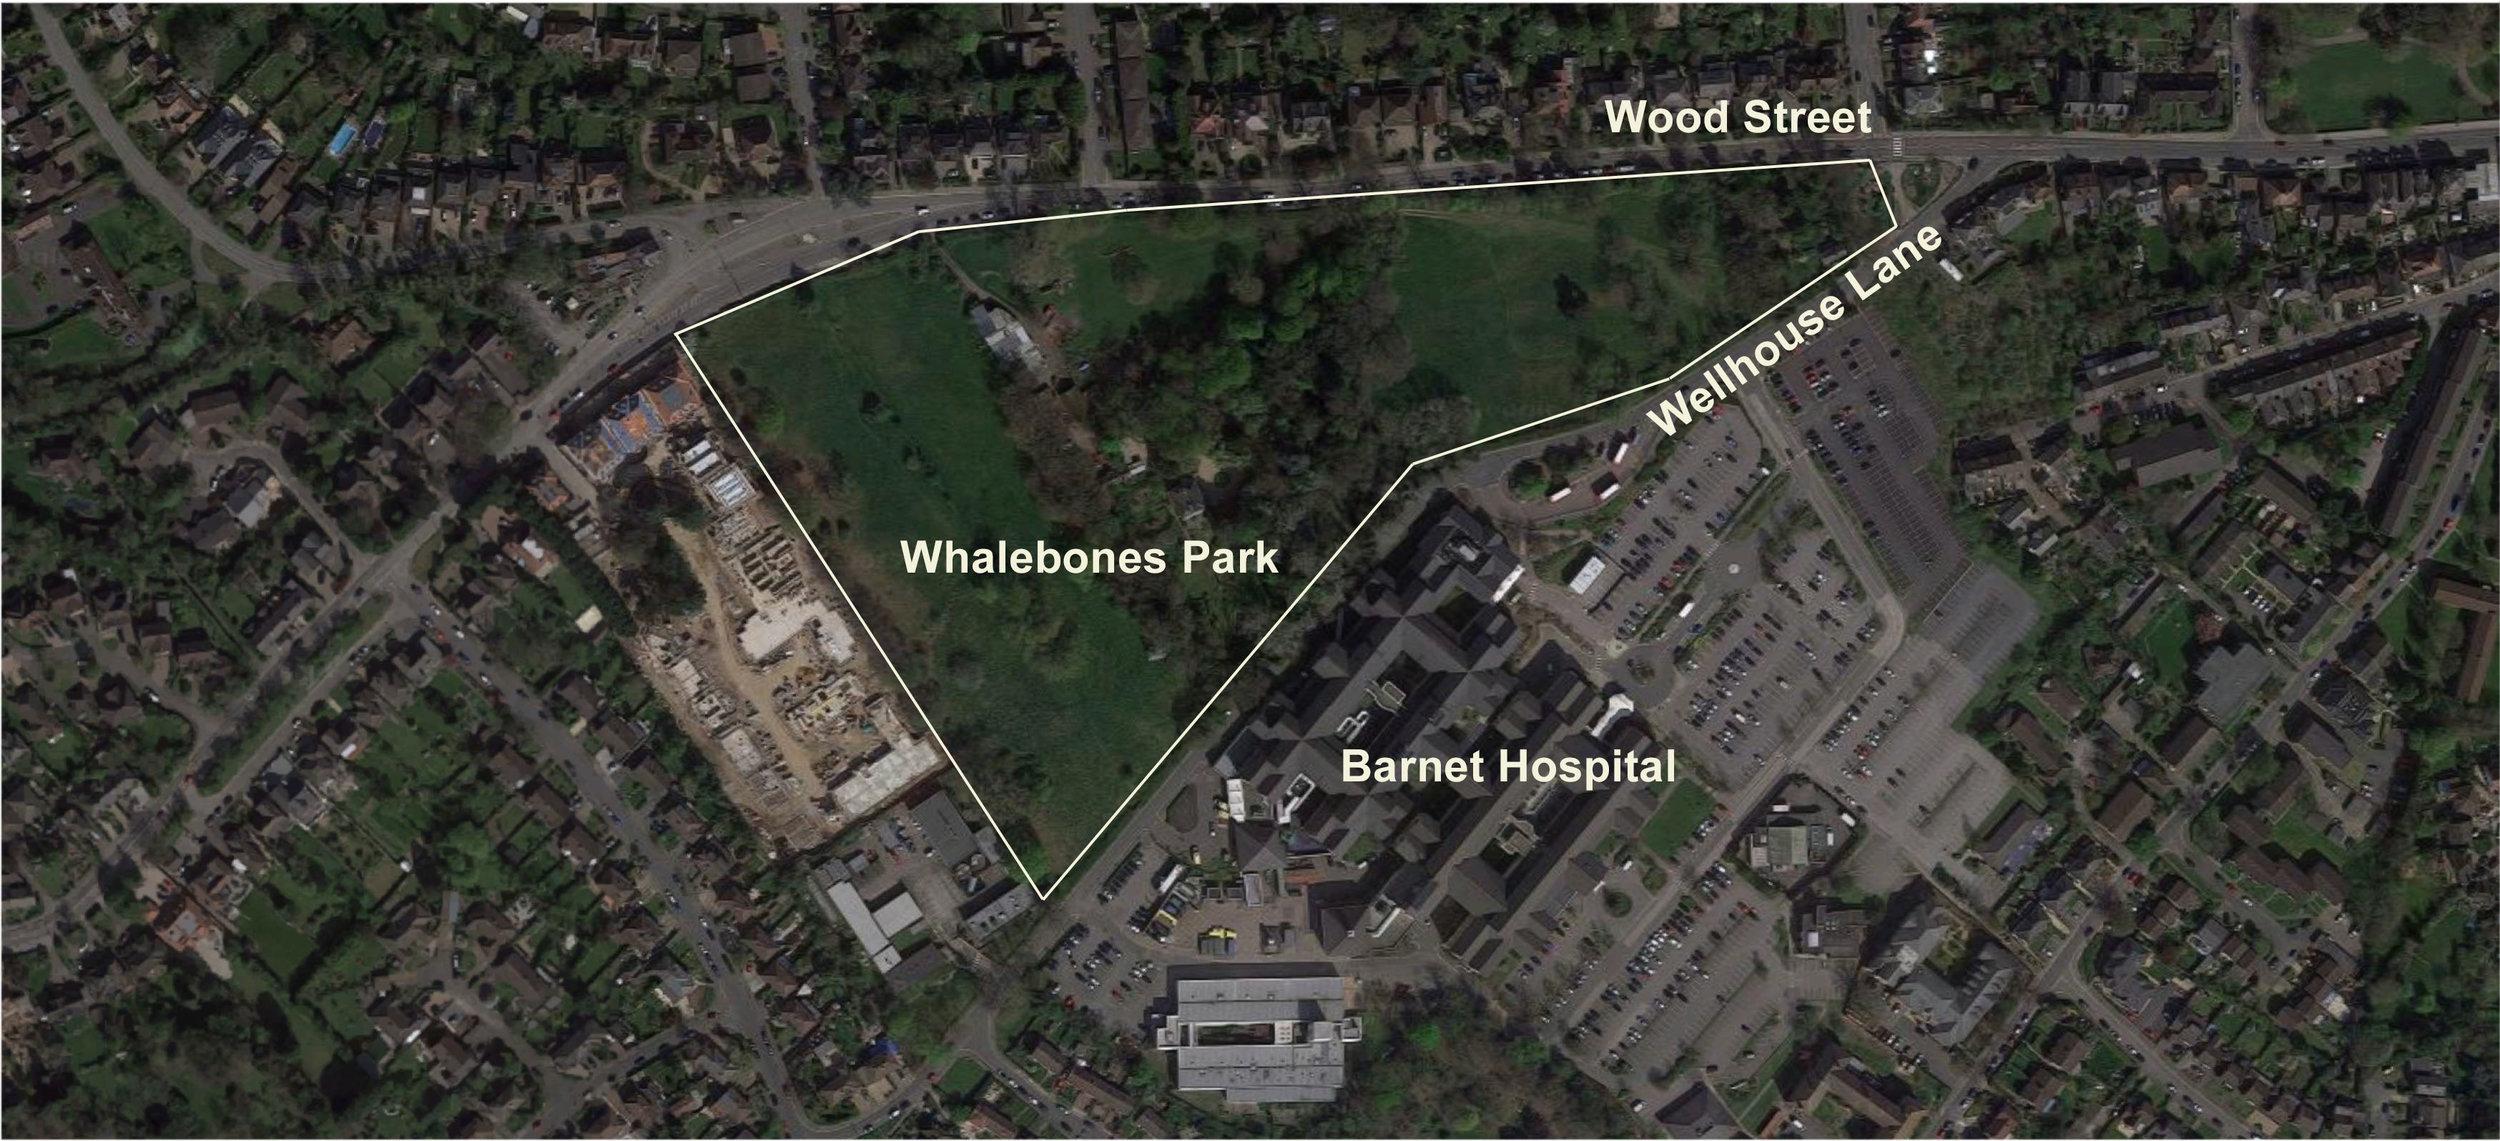 Wood street Barnet hospital map.jpg